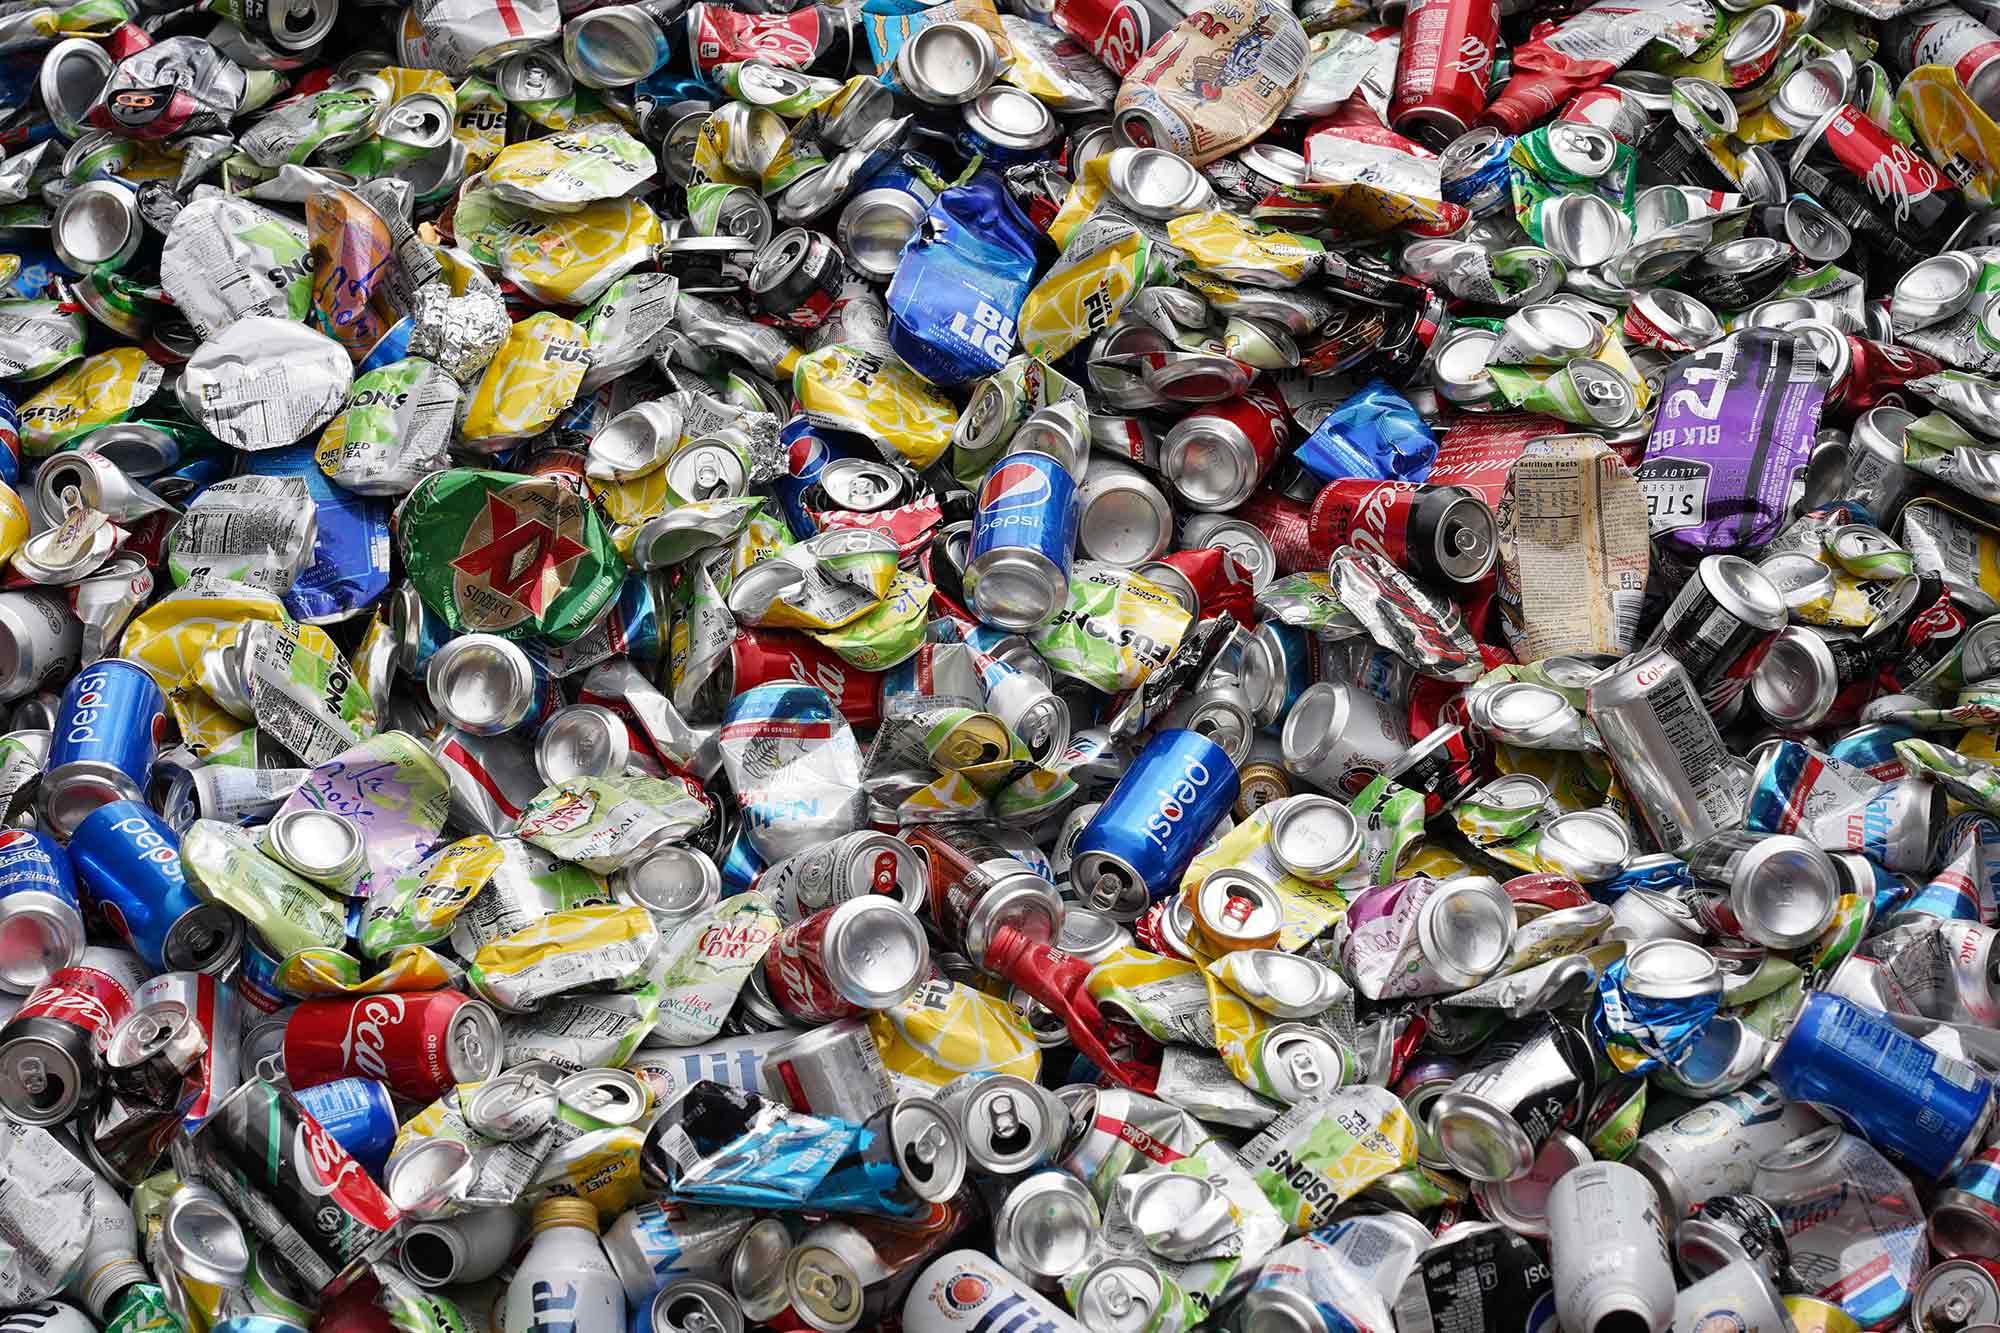 5 Reasons to Recycle Scrap Metal